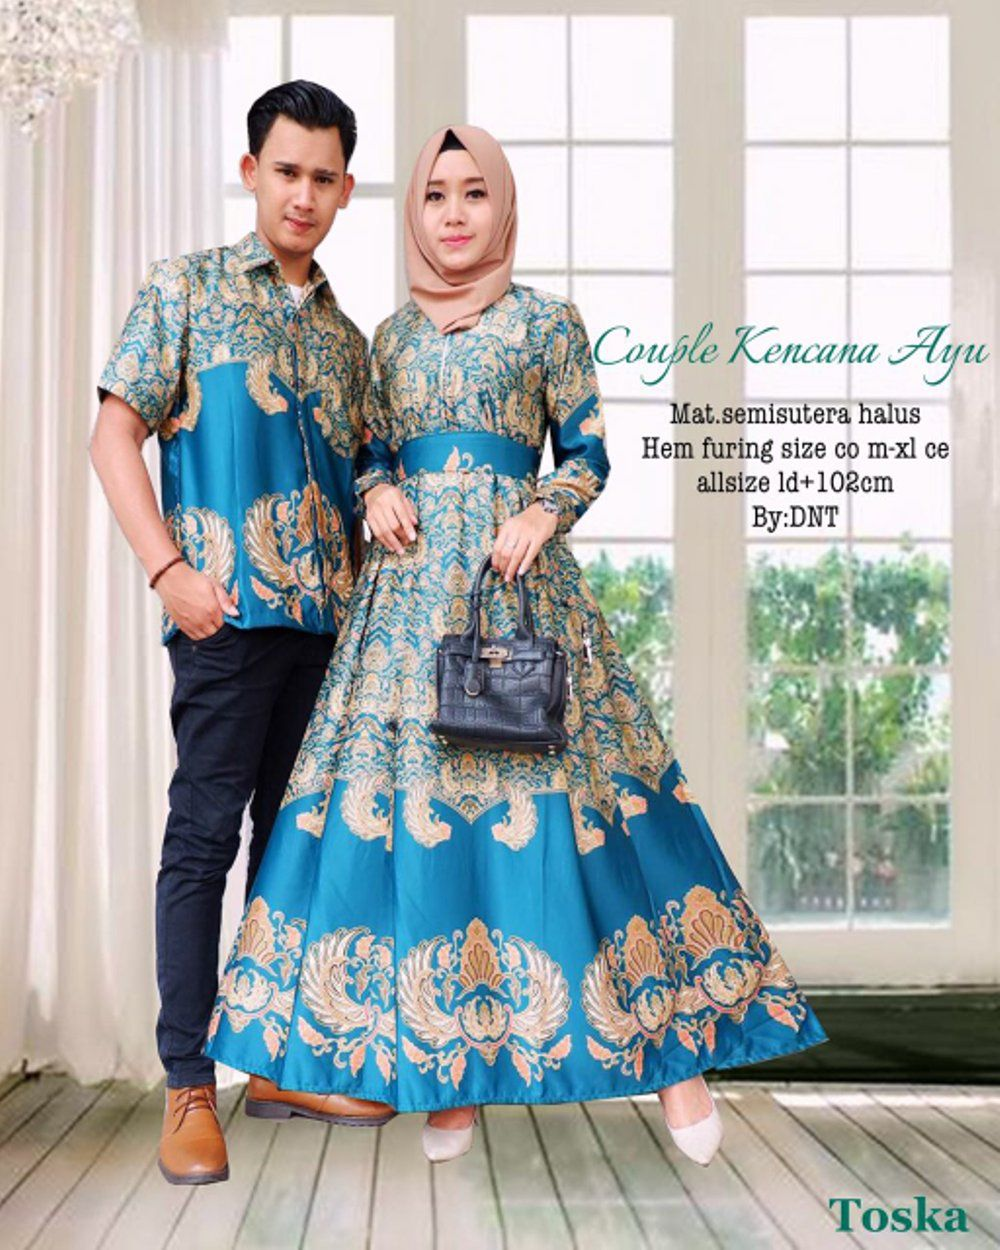 Setelan Model Baju Batik Couple Semi Sutra Kencana Ayu Warna Tosca